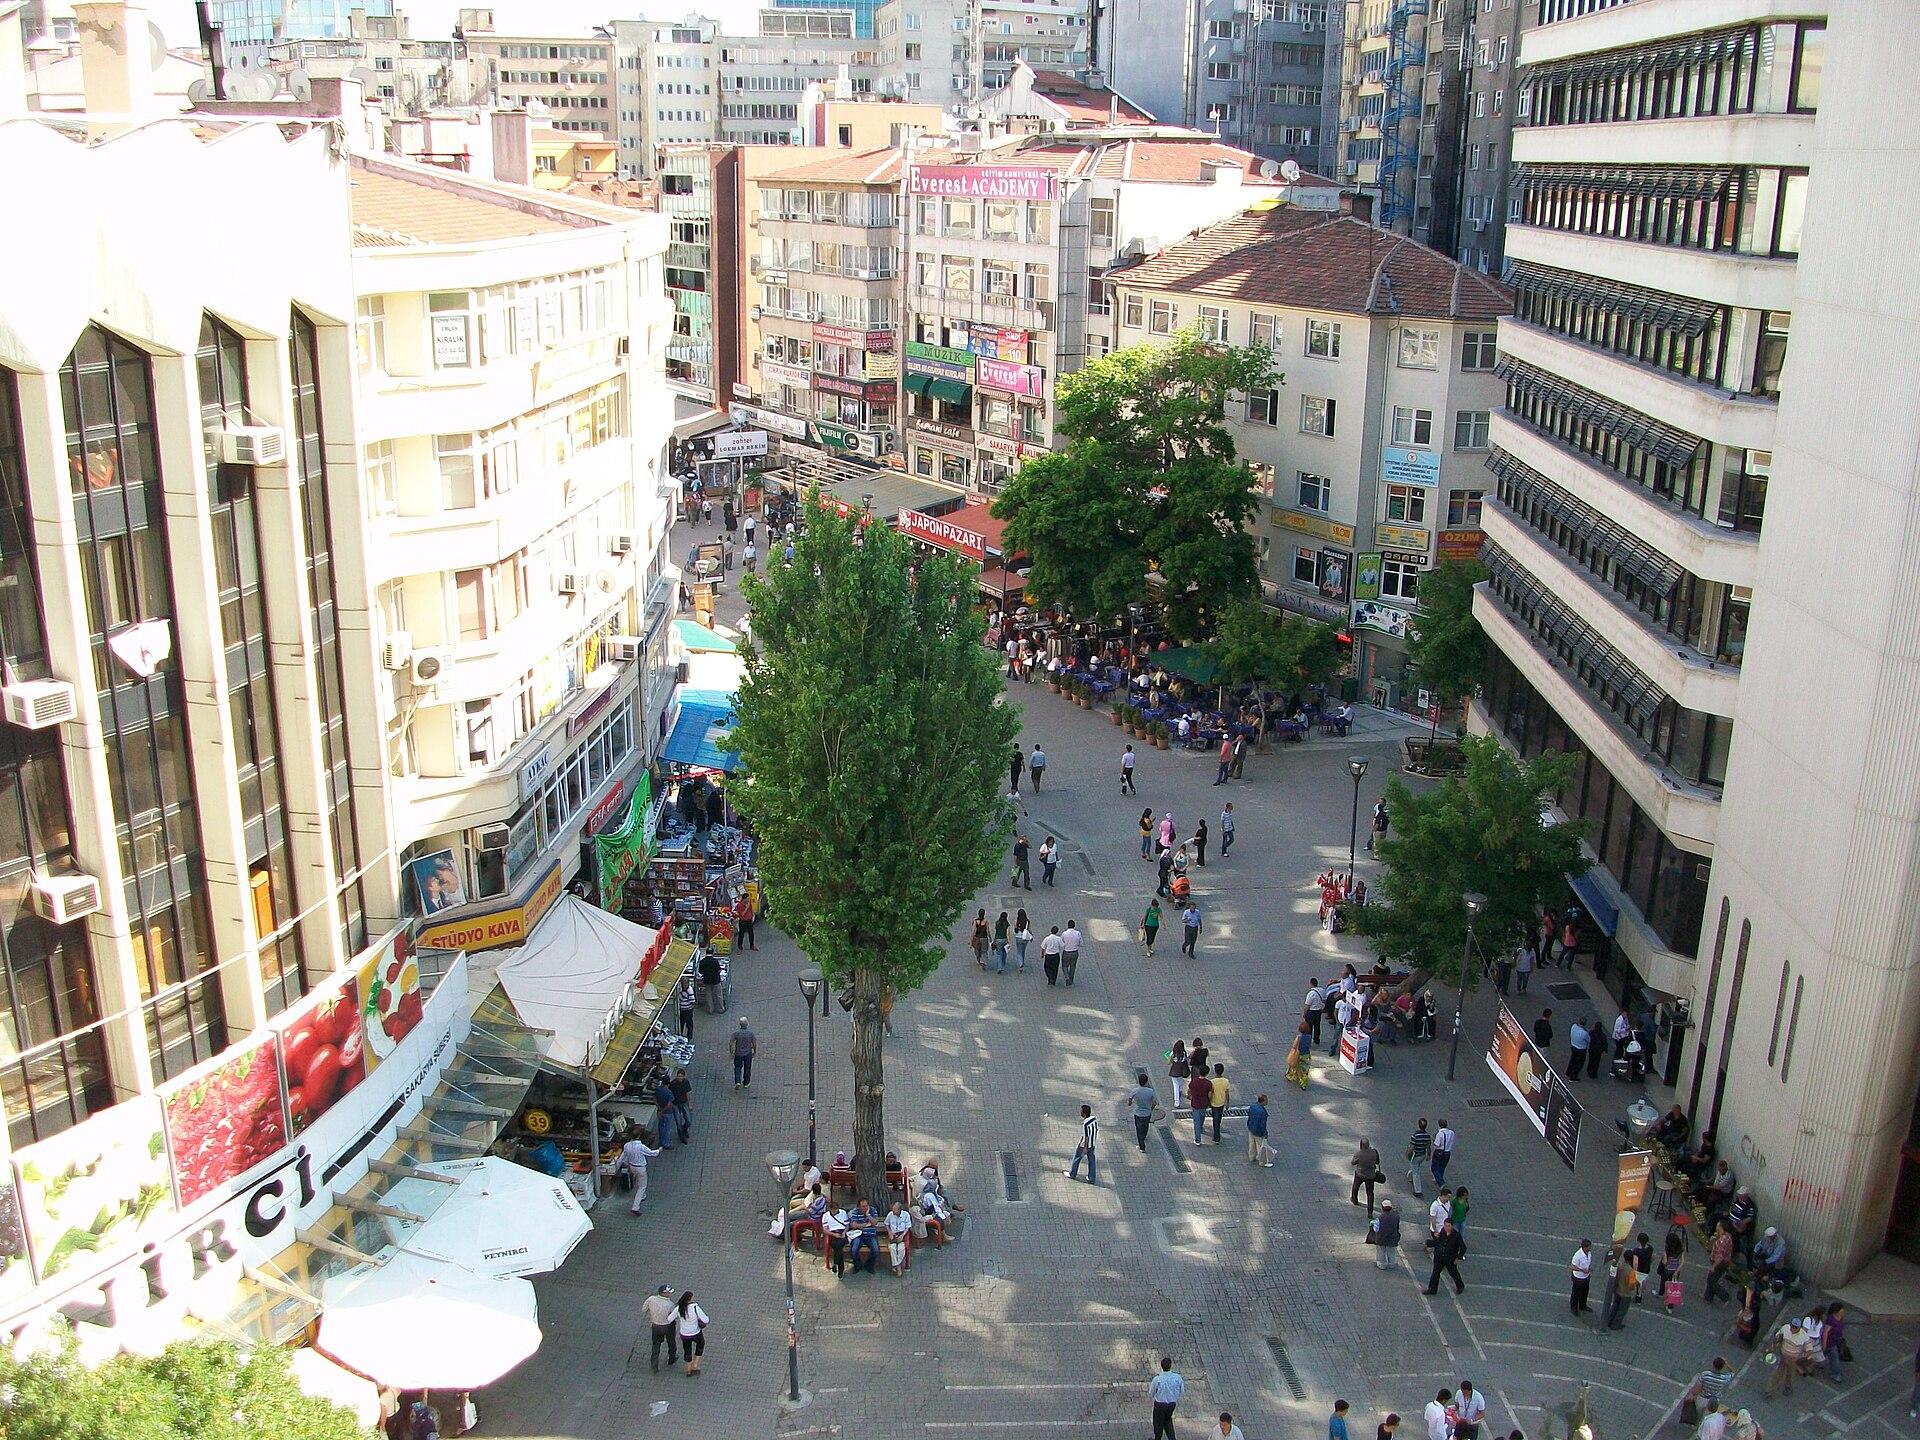 Kızılay, Ankara - Wikipedia